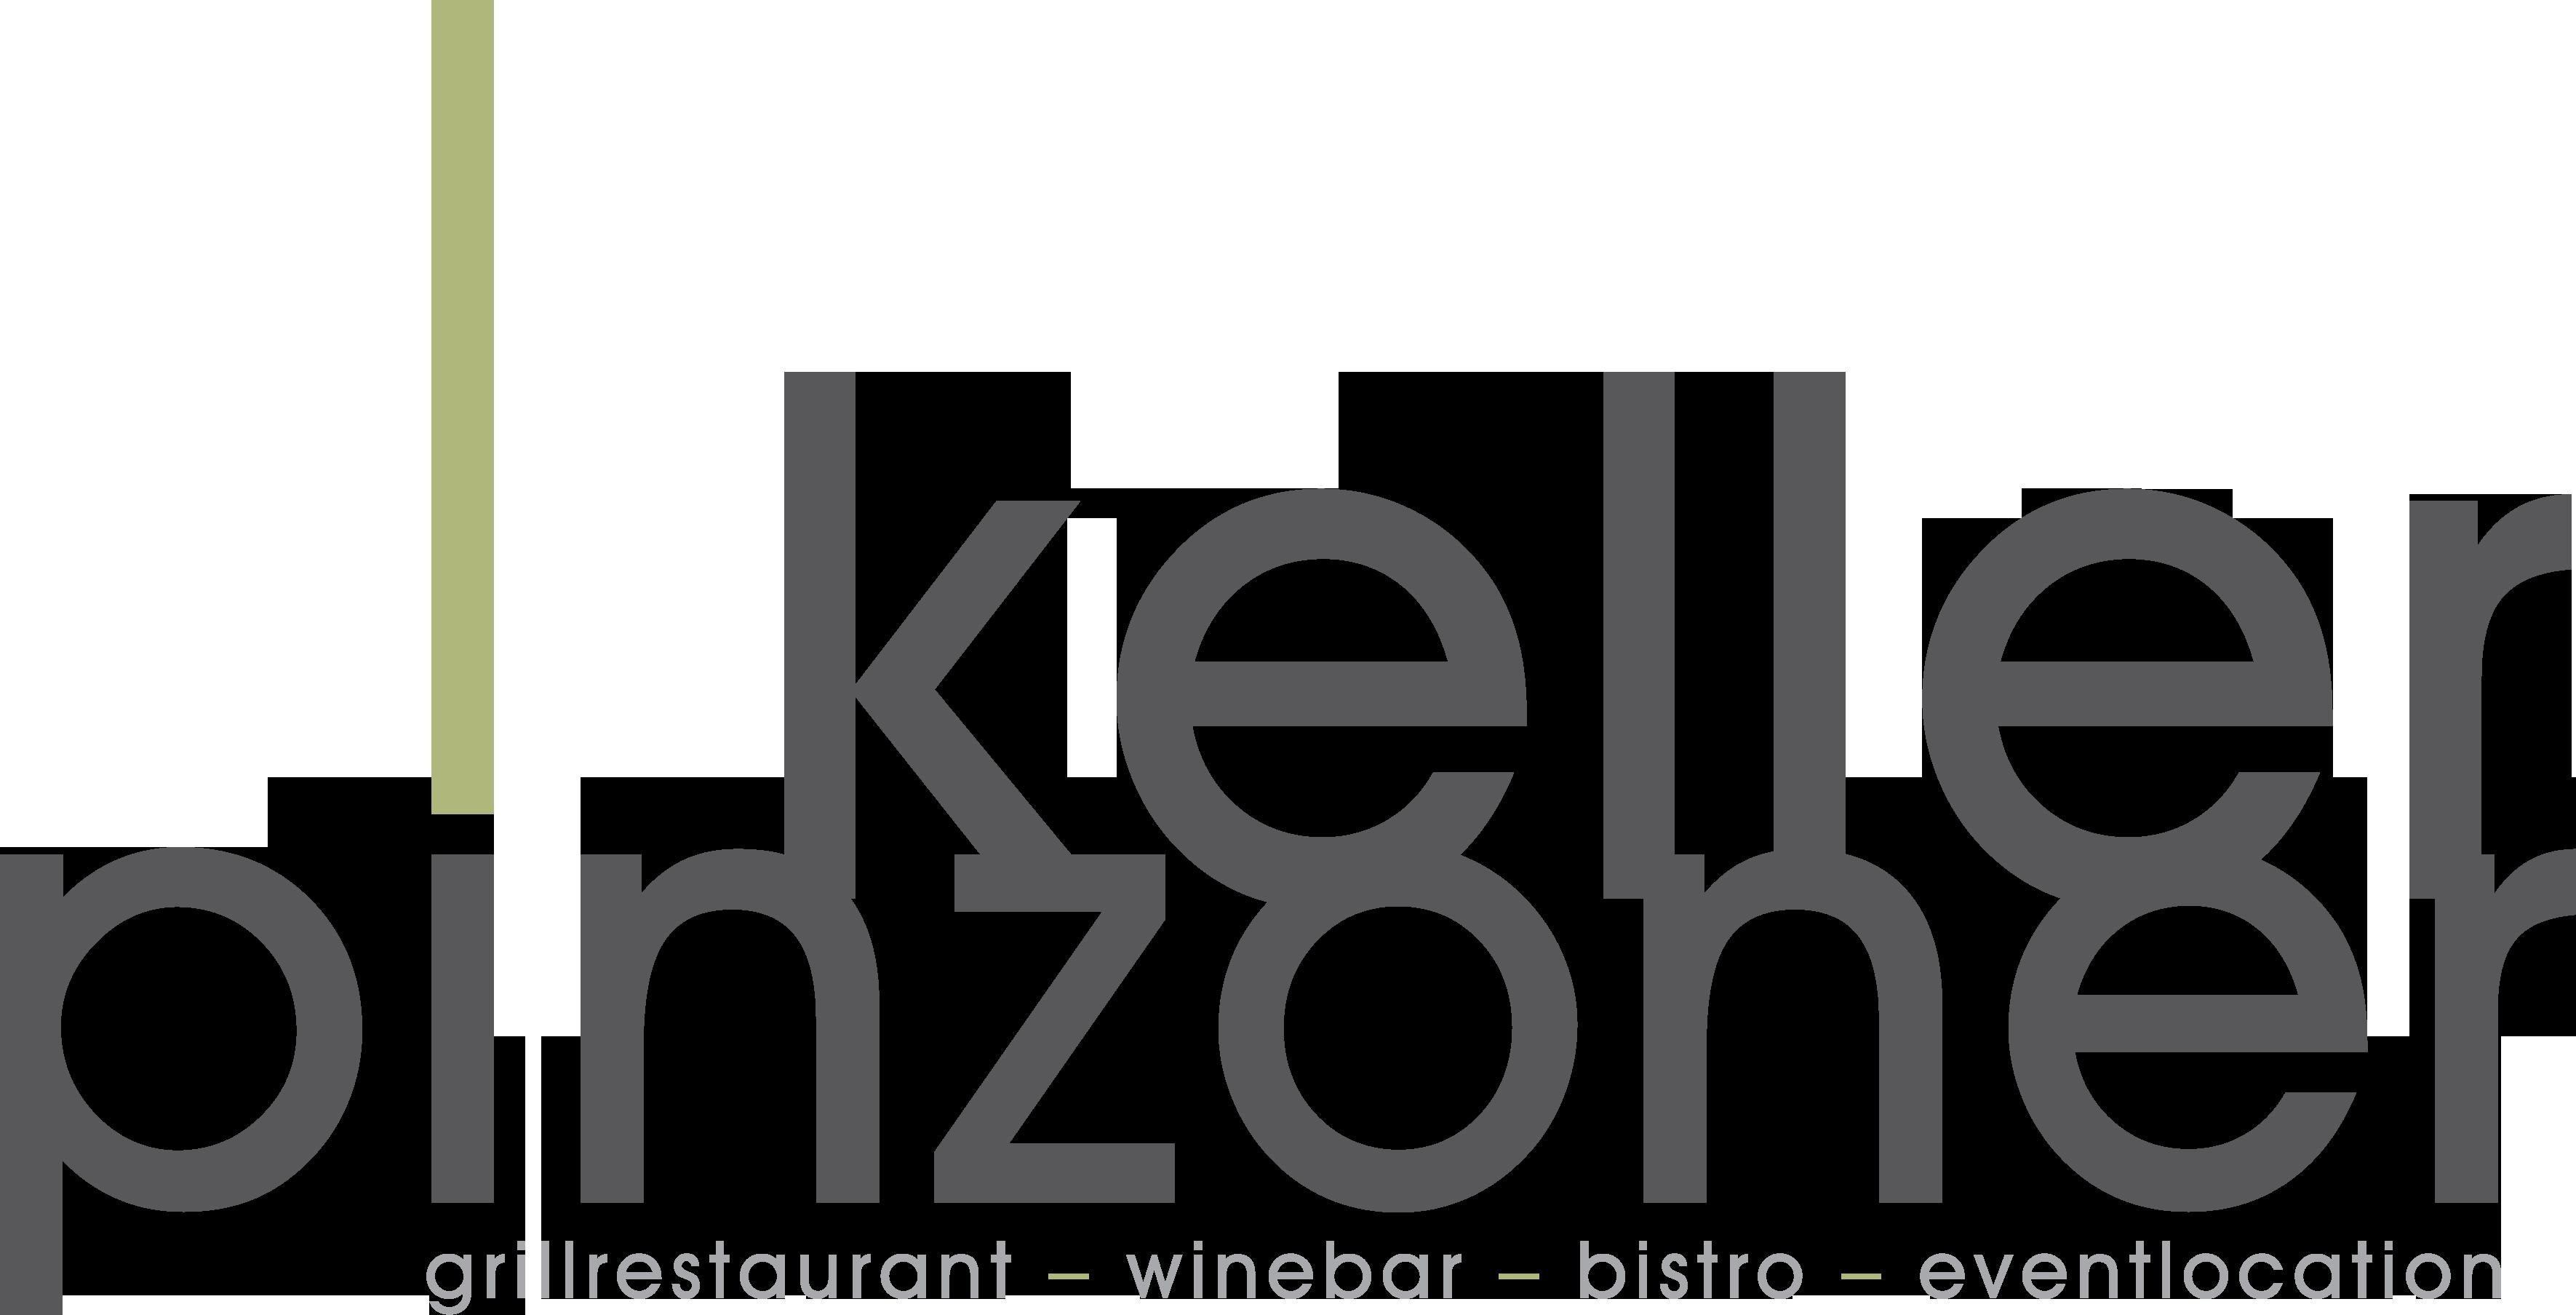 Pinzoner Keller